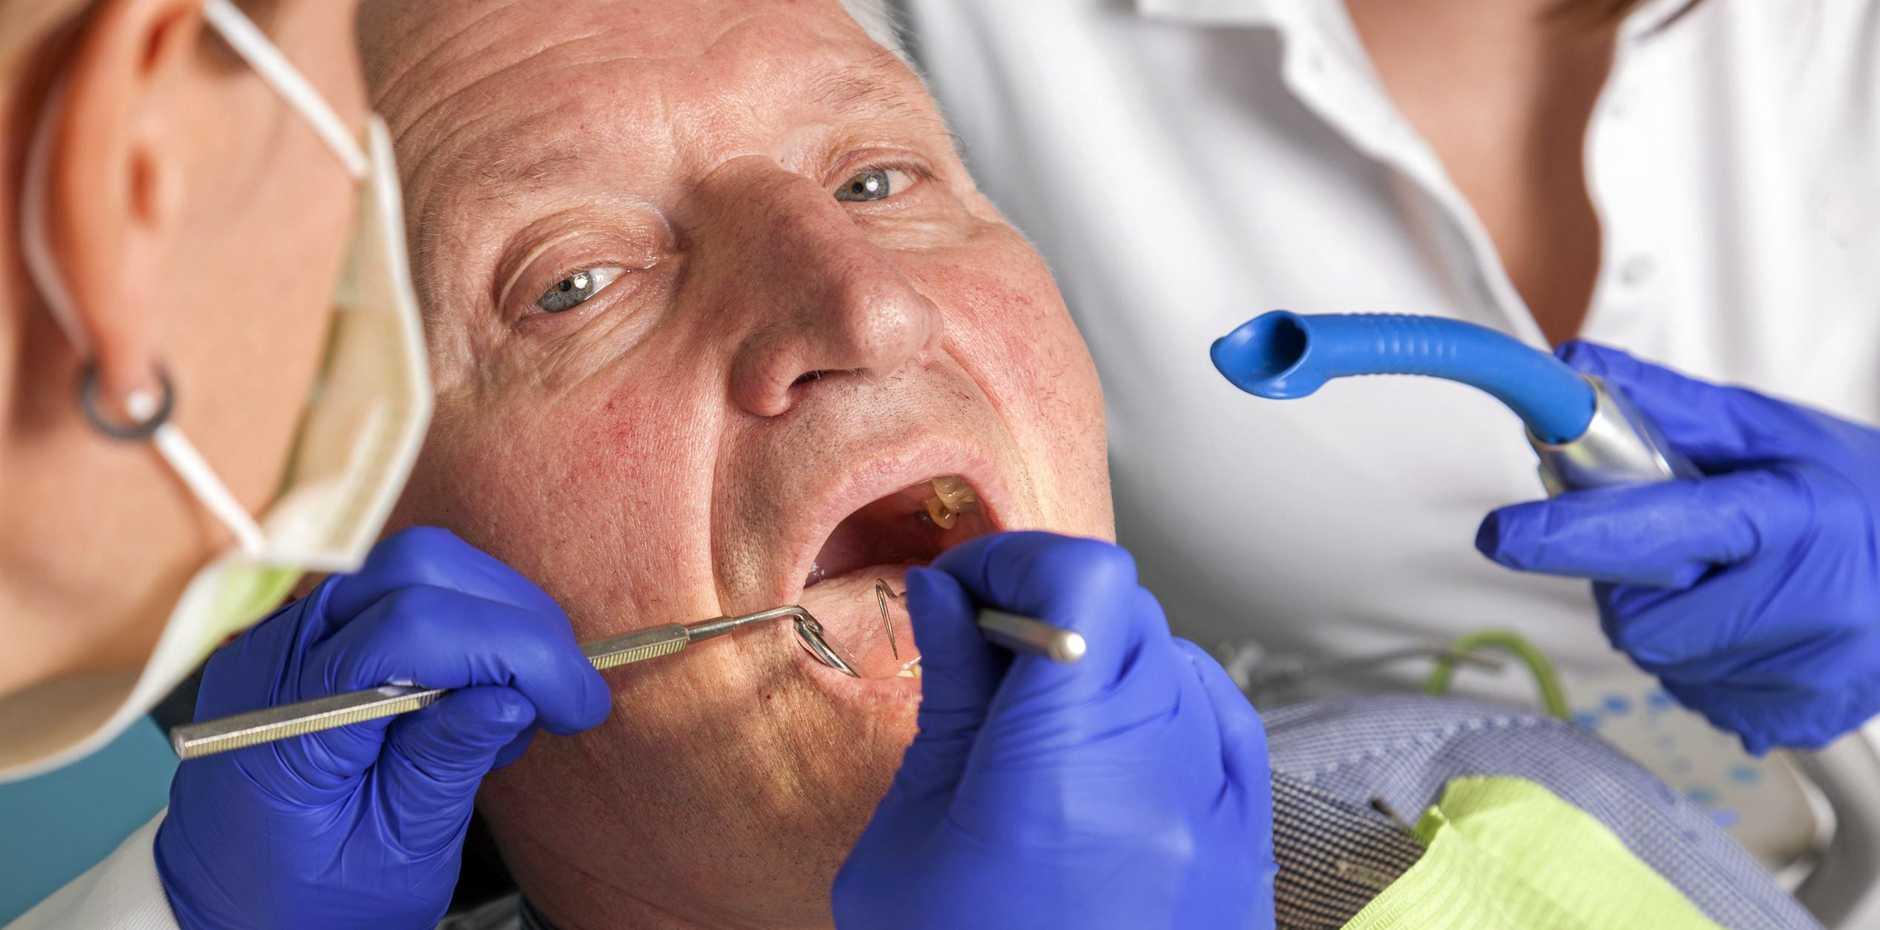 FOCUS ON DENTAL HEALTH: The Austalian Dental Health Foundation continues to build on its programs which help Australians access dental treatment.